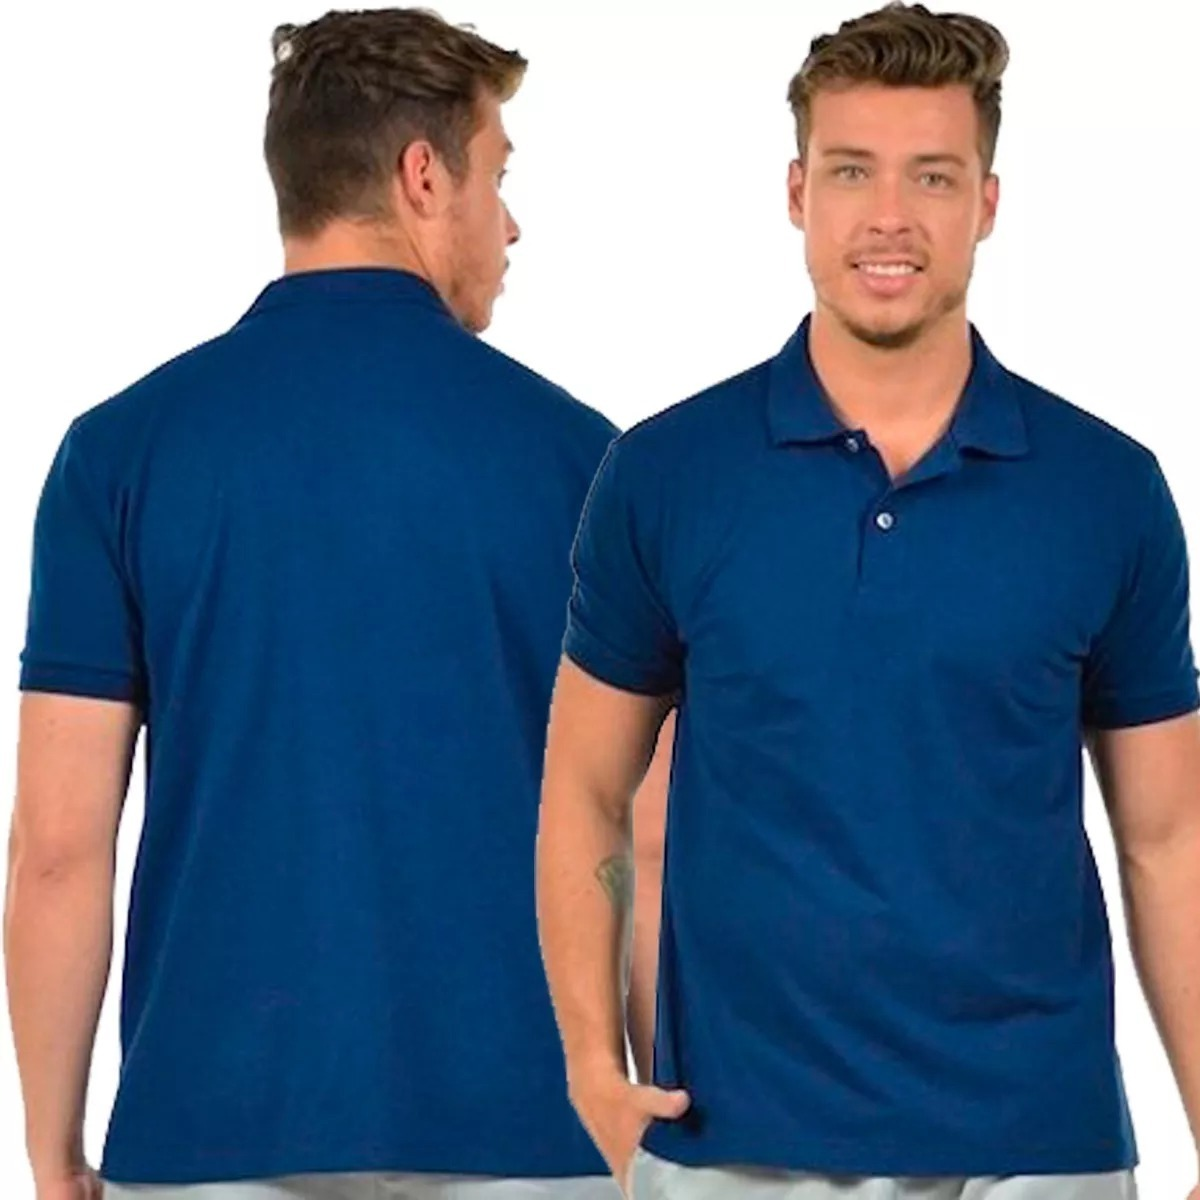 Kit 3 Camisas Polo Masculina + 3 Camisas Polo Feminina - R  163 b7e76ce01af4c